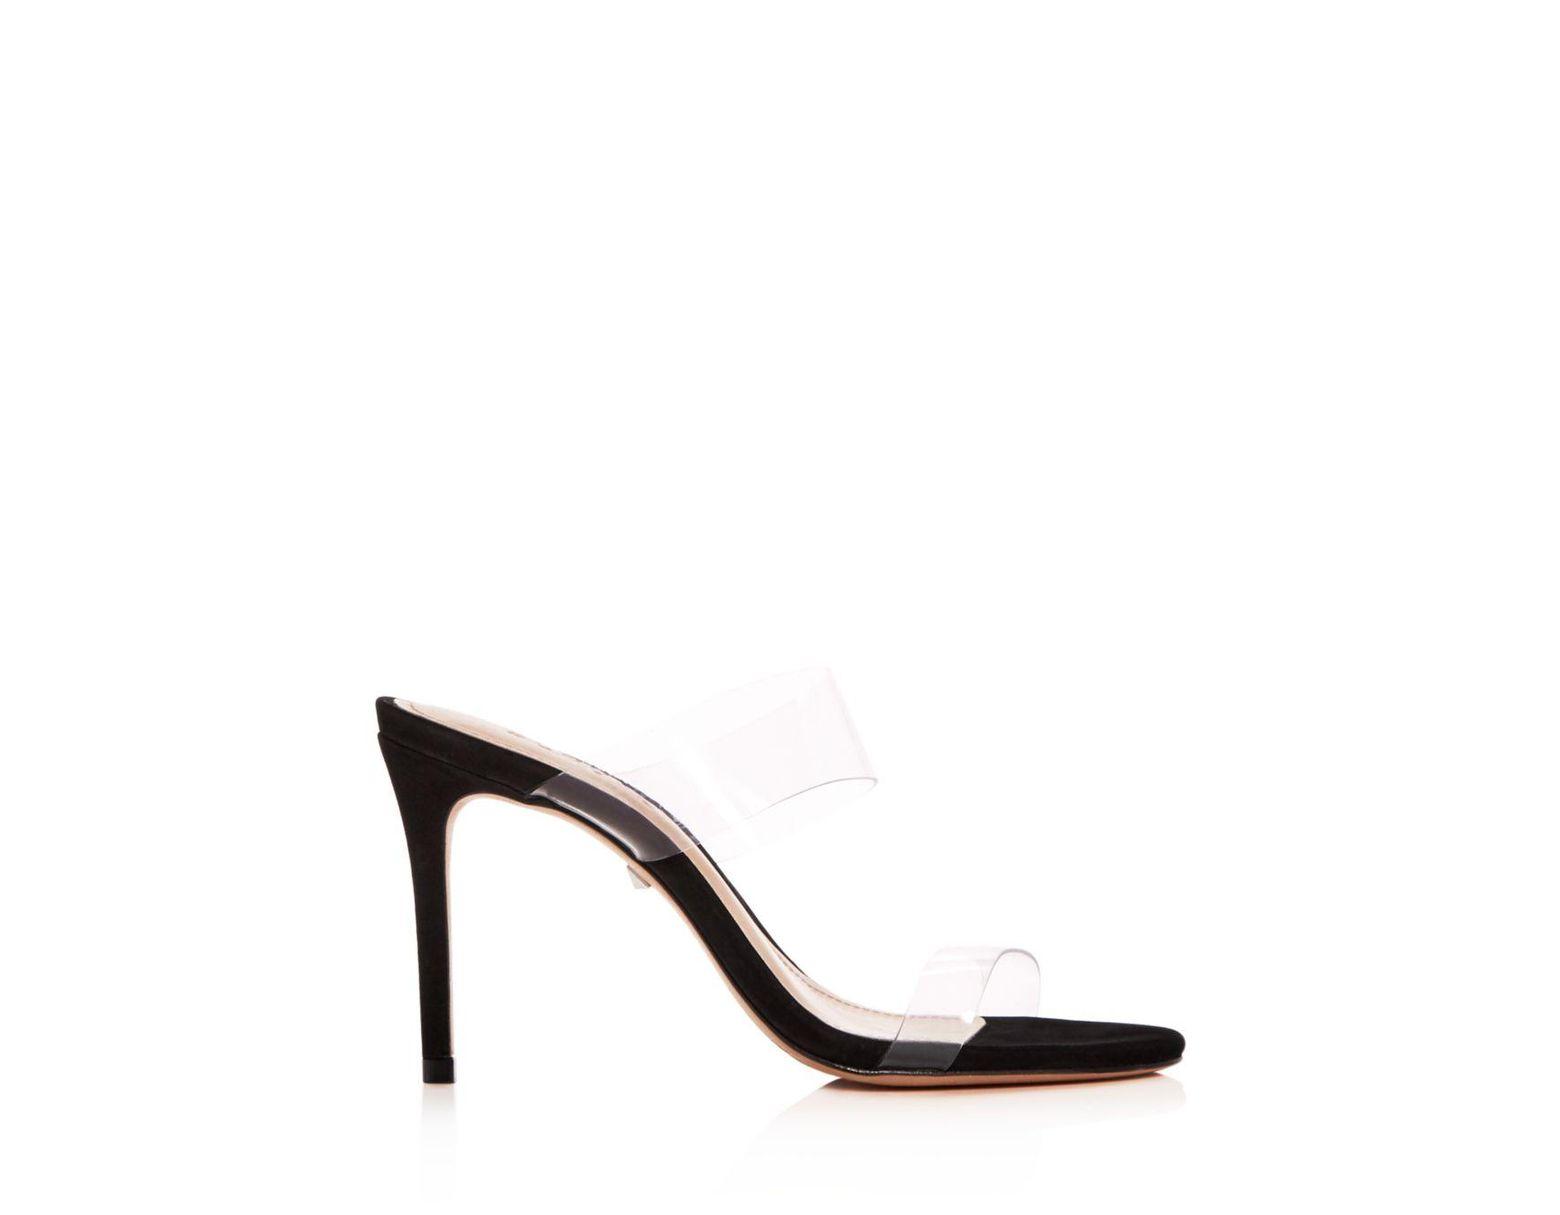 d77f84a42b Schutz Women's Ariella Clear Strap High - Heel Slide Sandals in Black -  Save 6% - Lyst